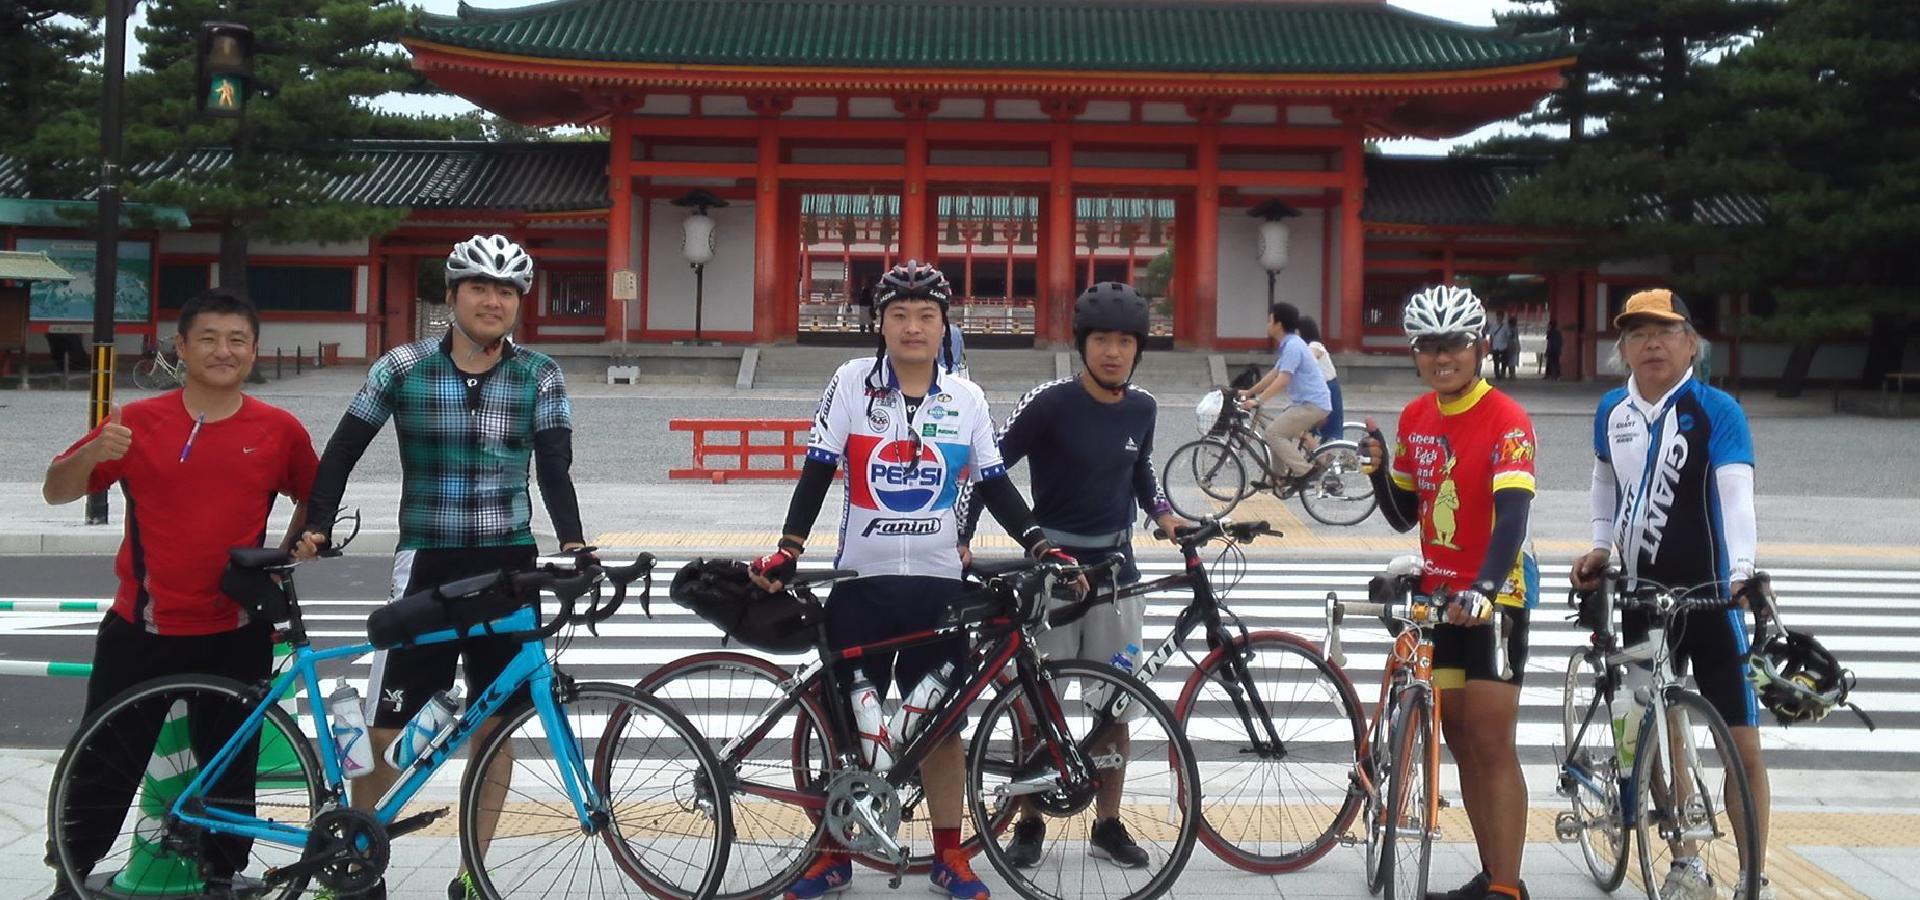 JAPANT TOURISM ORGANIZATION